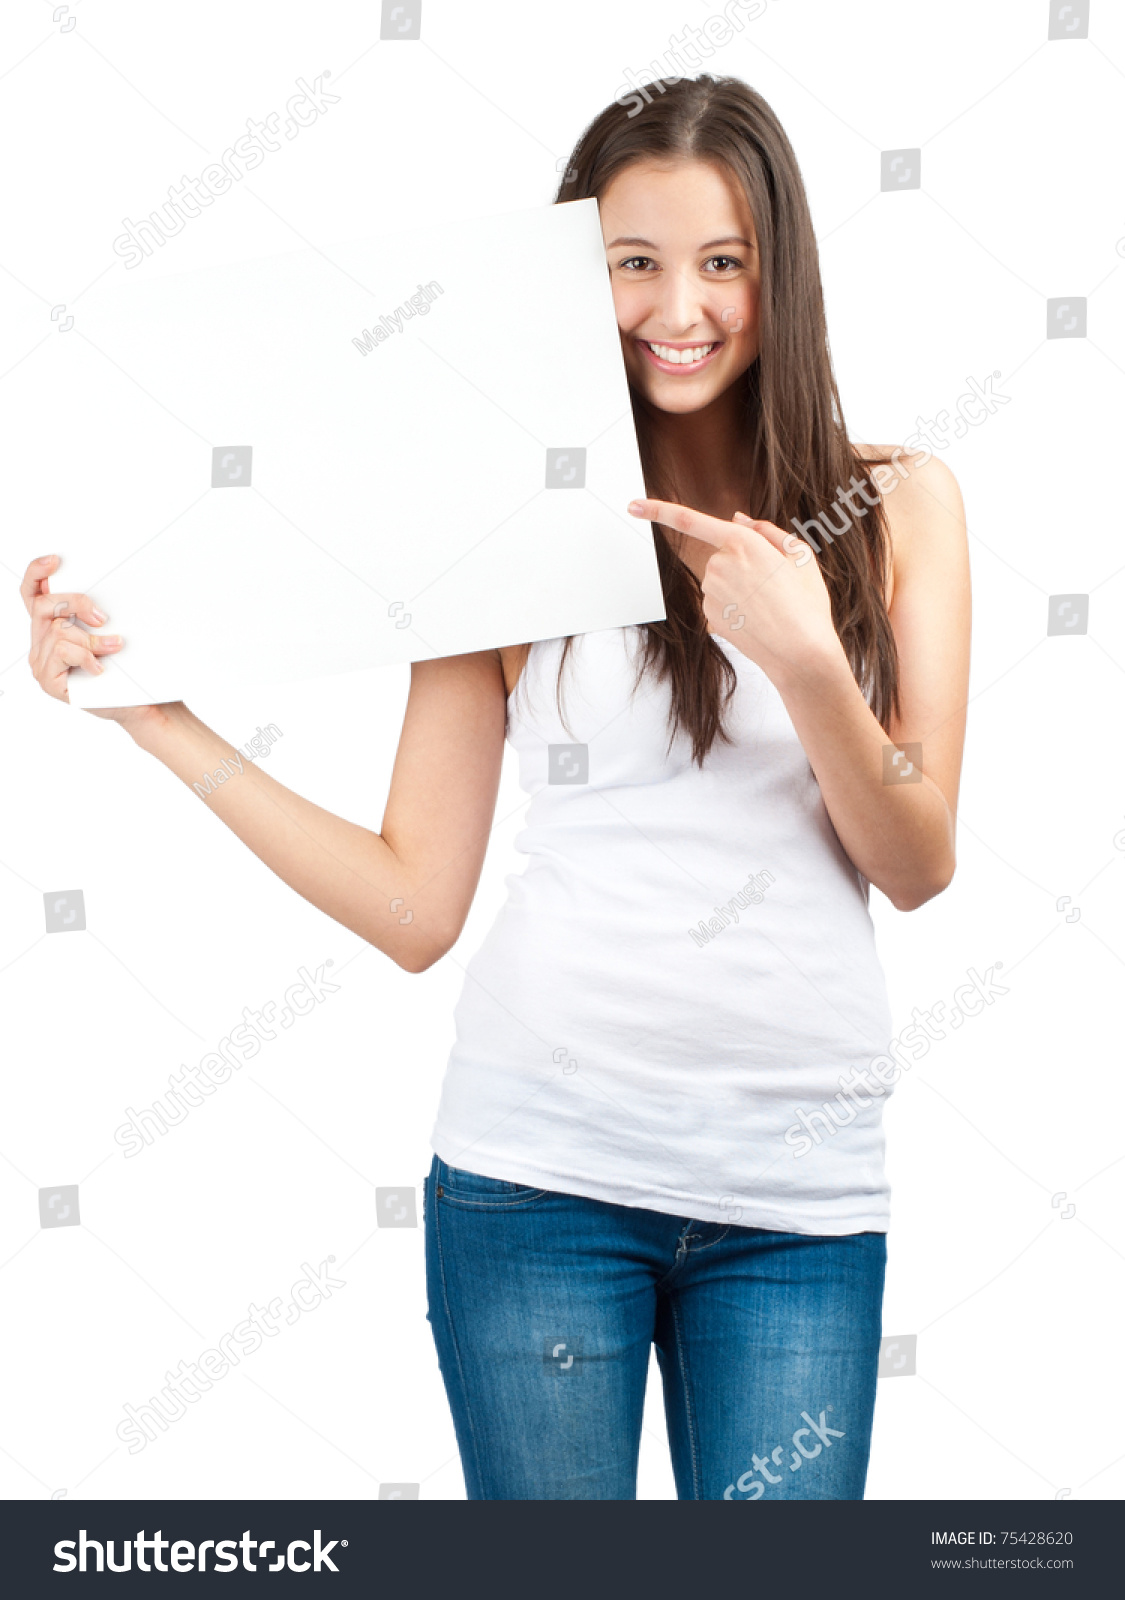 Плакат на 9 Мая своими руками, фото, видео